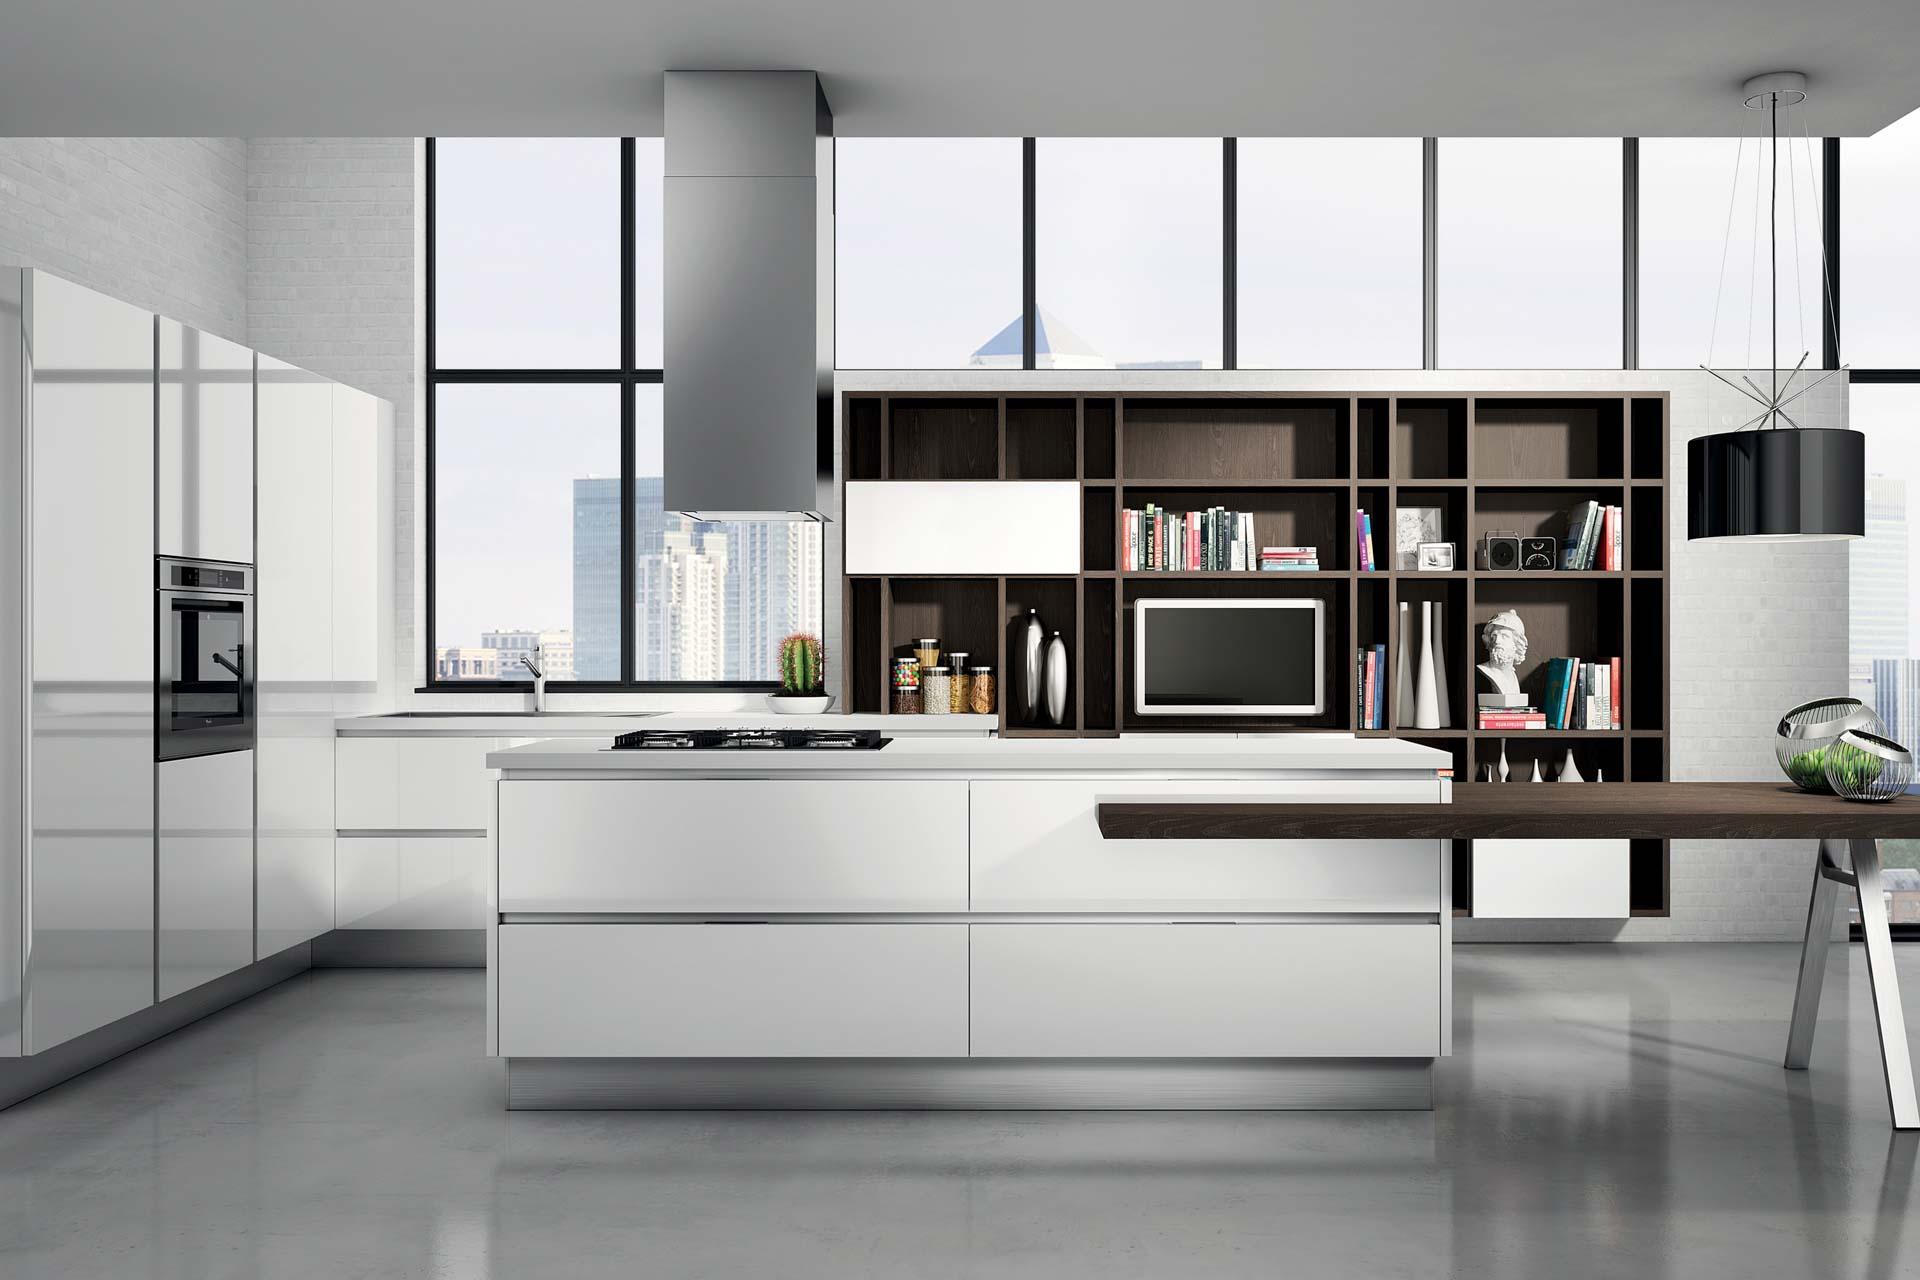 Living Room Storage Cabinets – Bella | European Cabinets ...